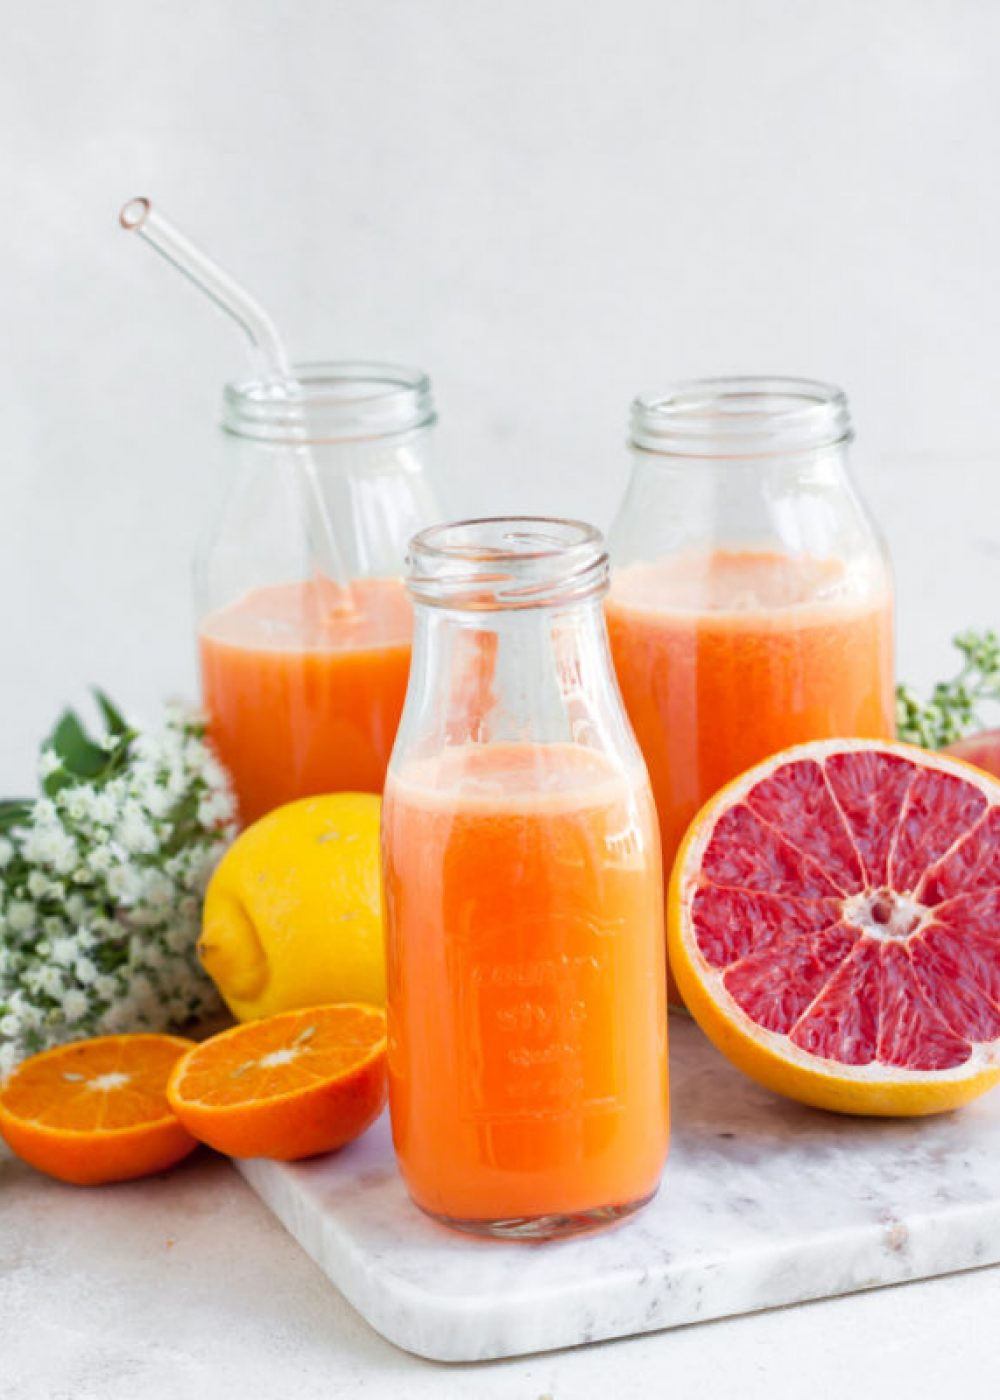 Pompelmoes, wortel, sinaasappel sap